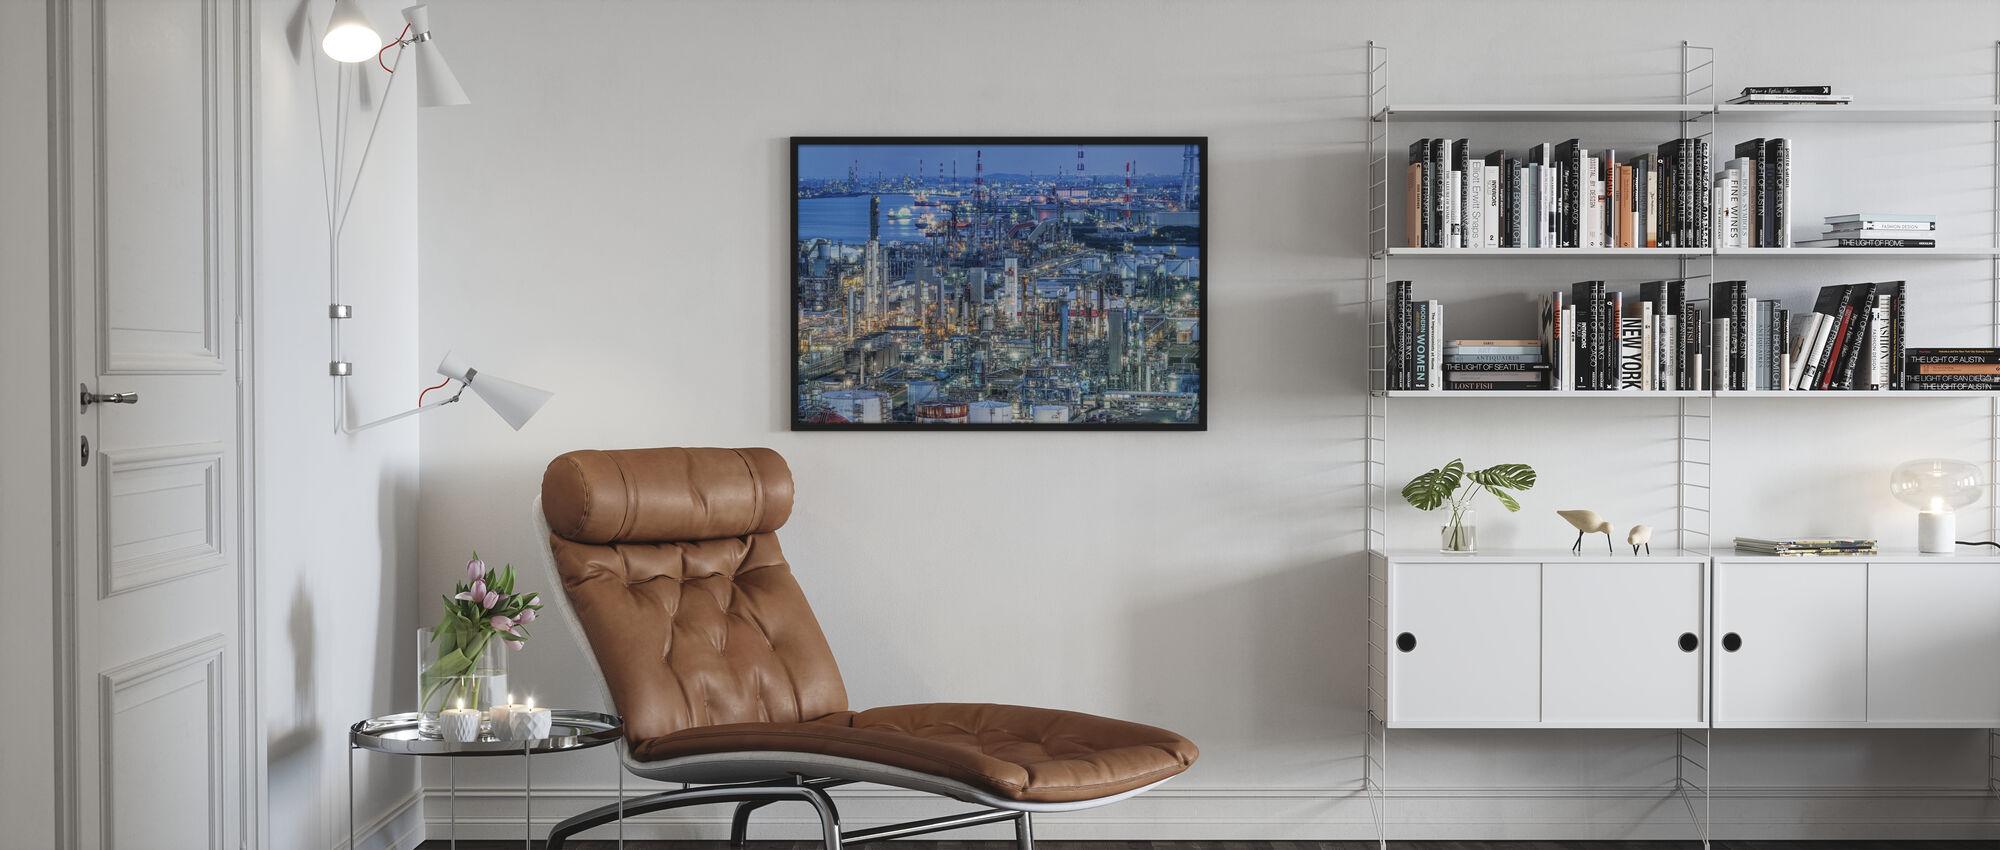 Coastal Industrial Area - Poster - Living Room